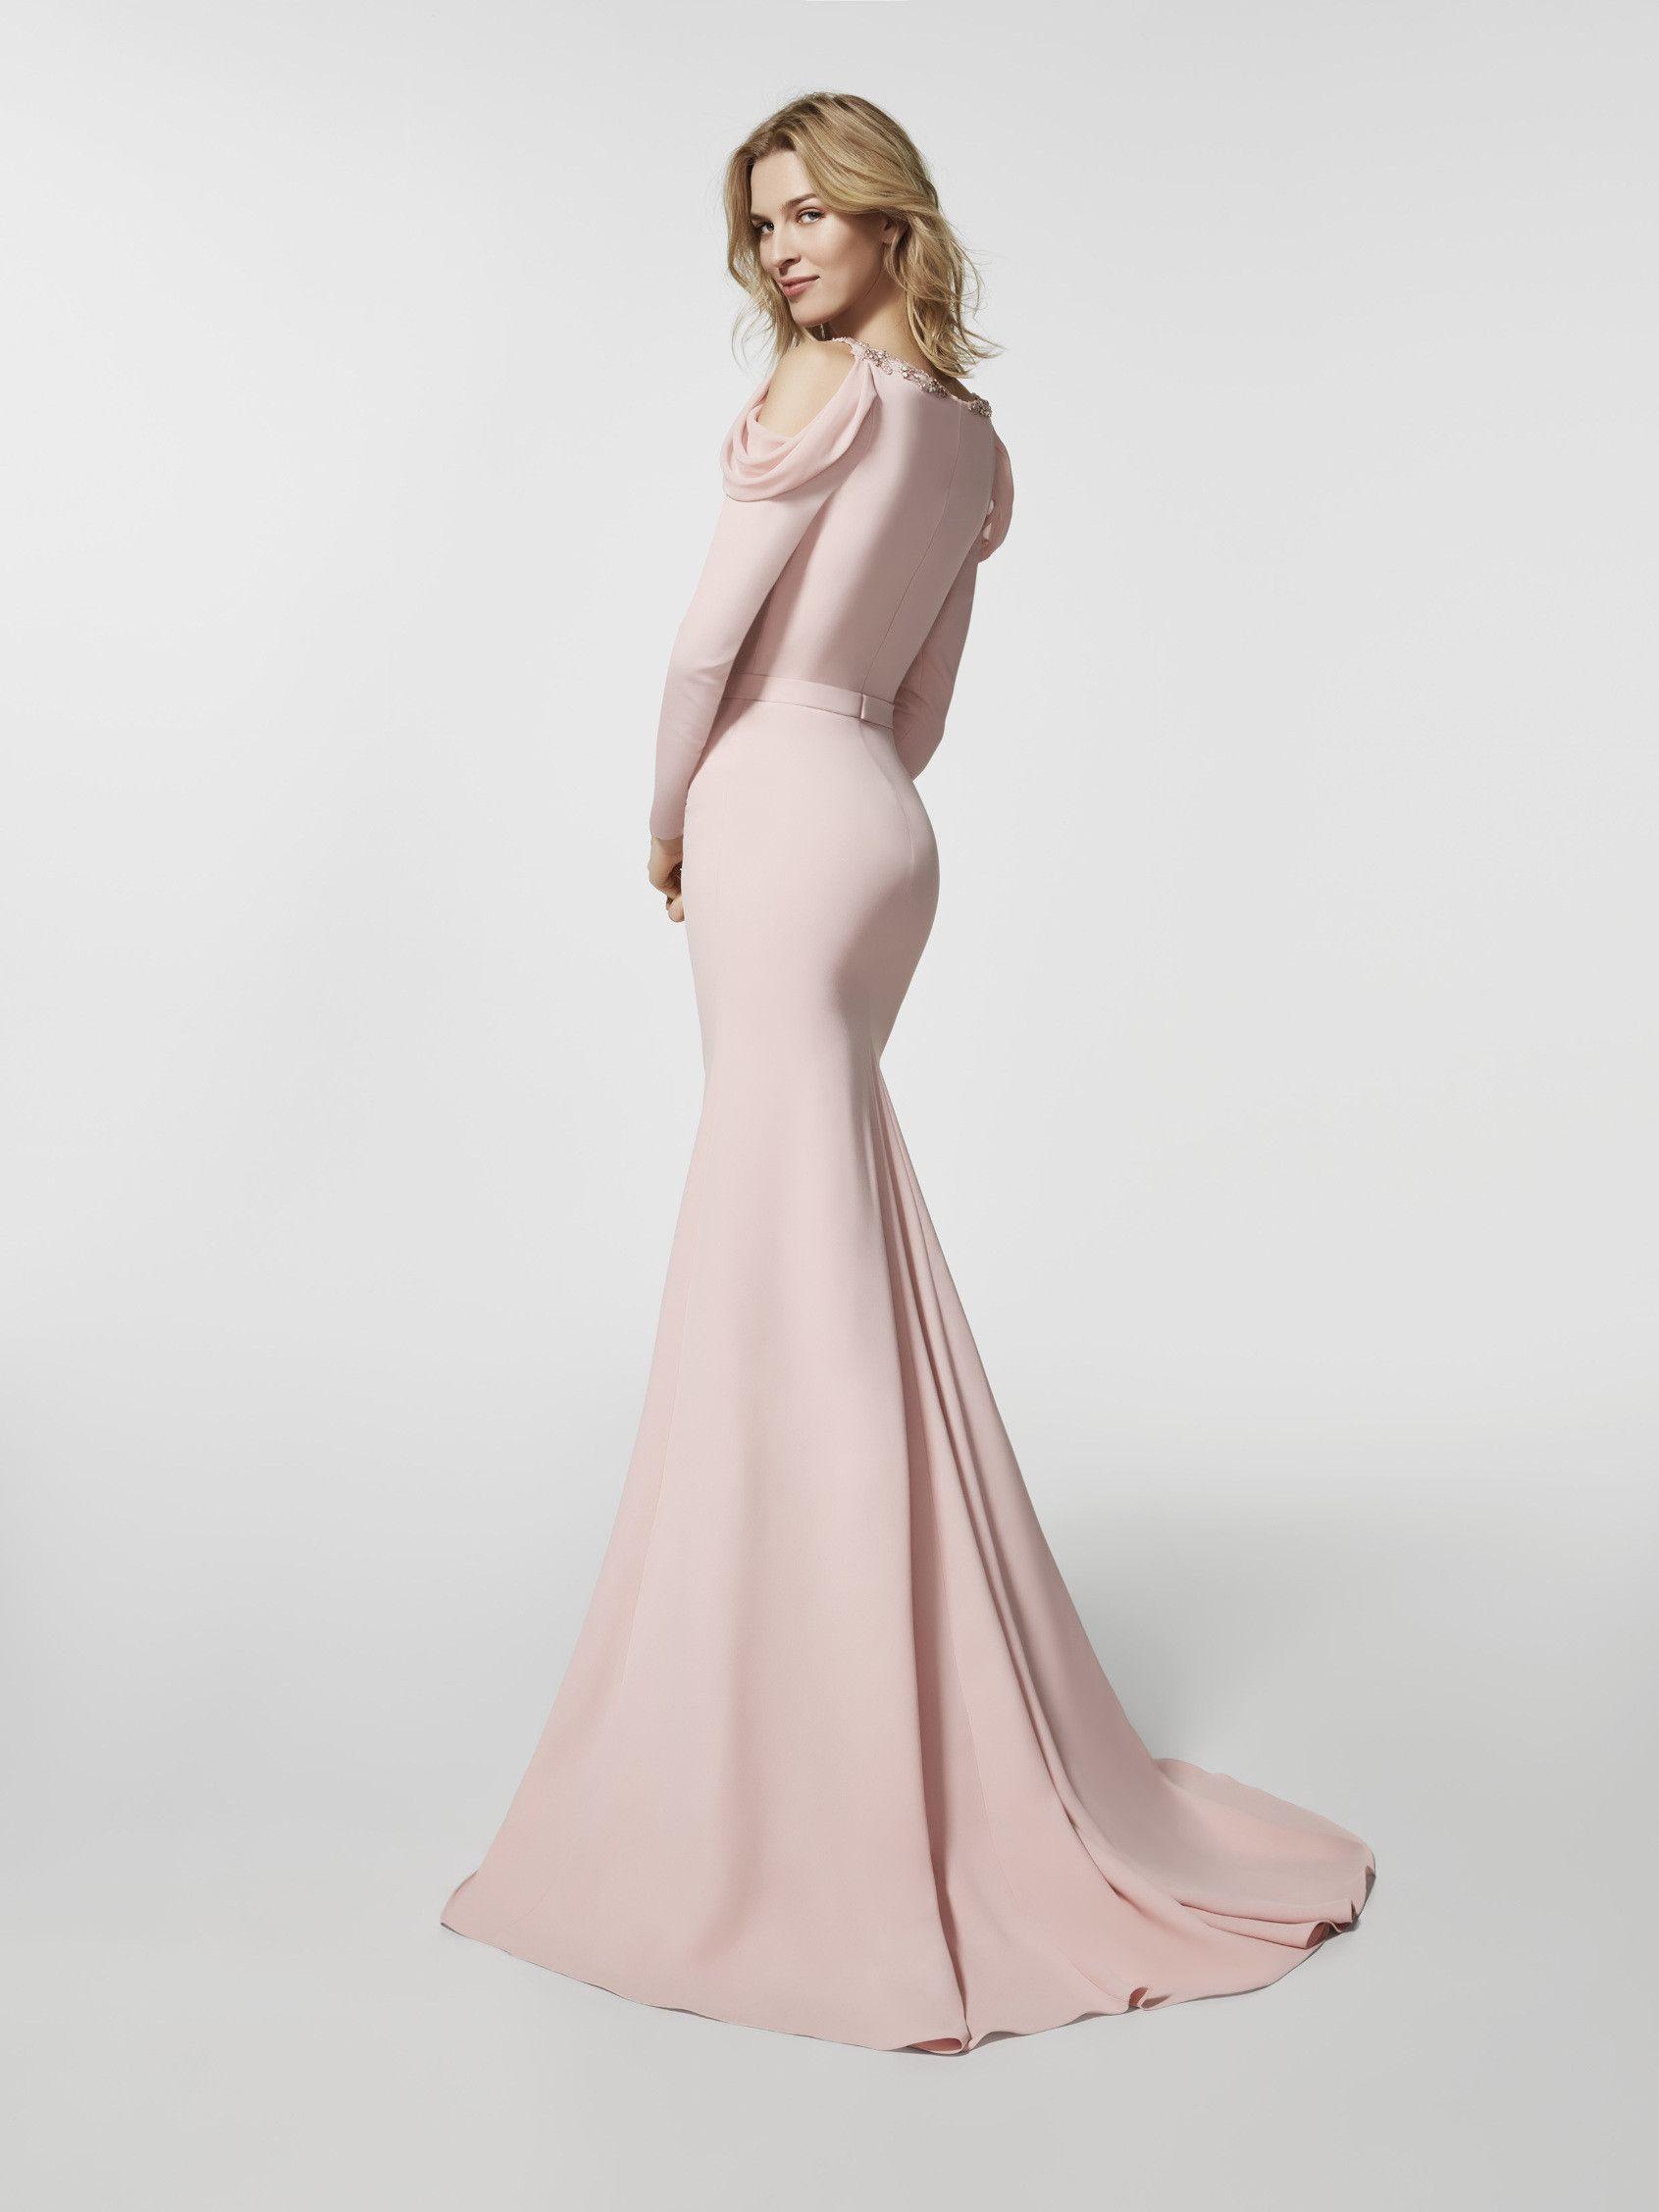 c56ae1f30 Imagen del vestido de fiesta rosa pálido (62063). Vestido GROVE largo manga  larga